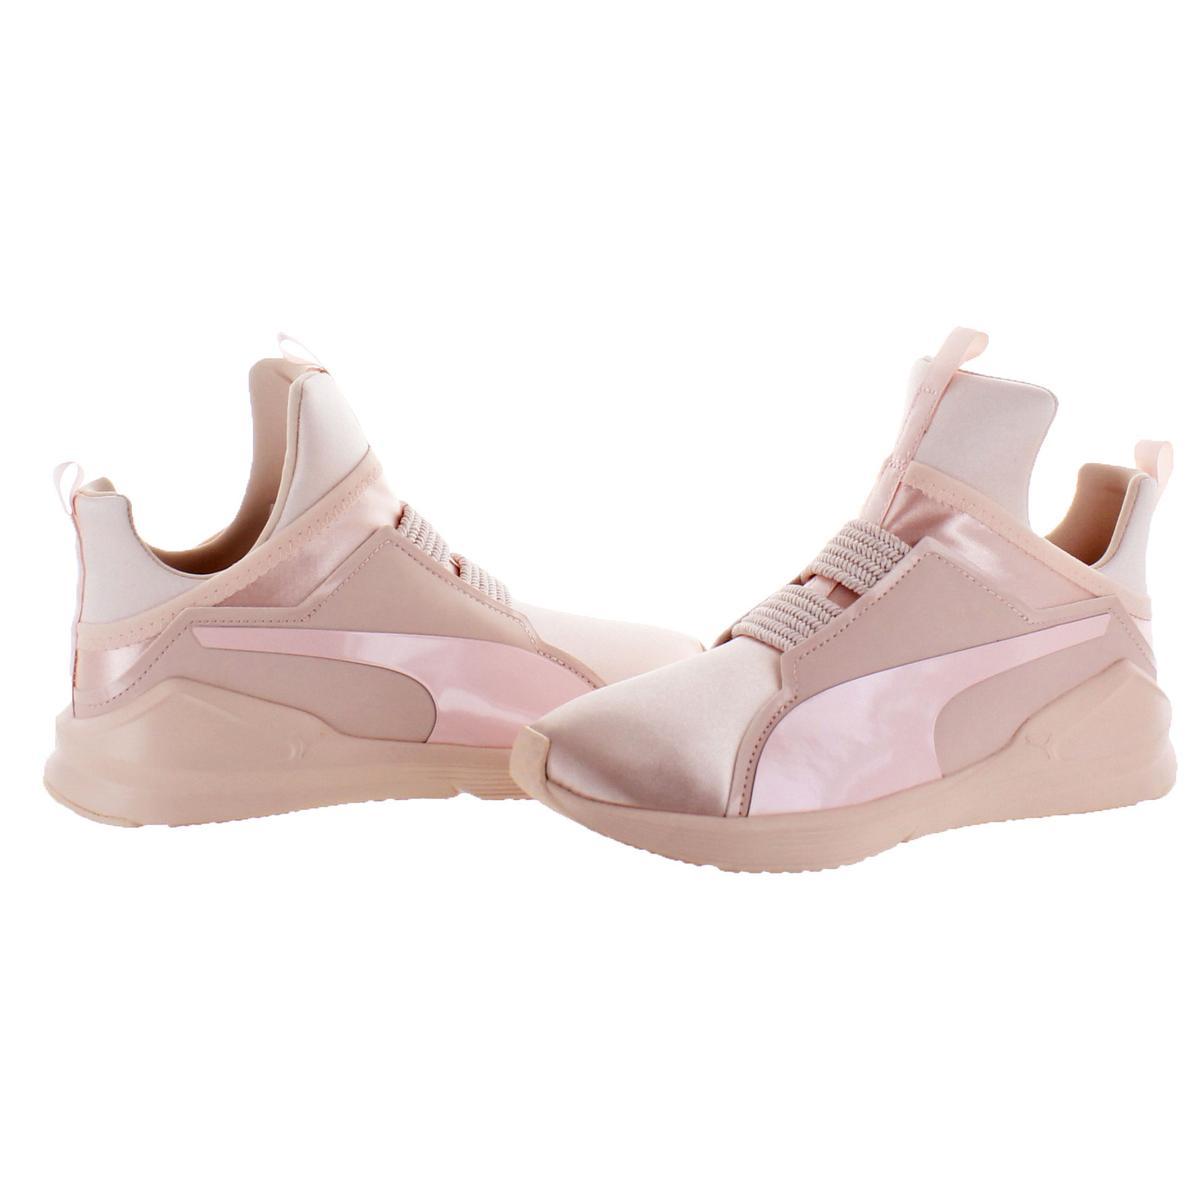 37c4a320954 Puma Fierce Satin EP Women s Demi Height Trainer Fashion Sneaker ...